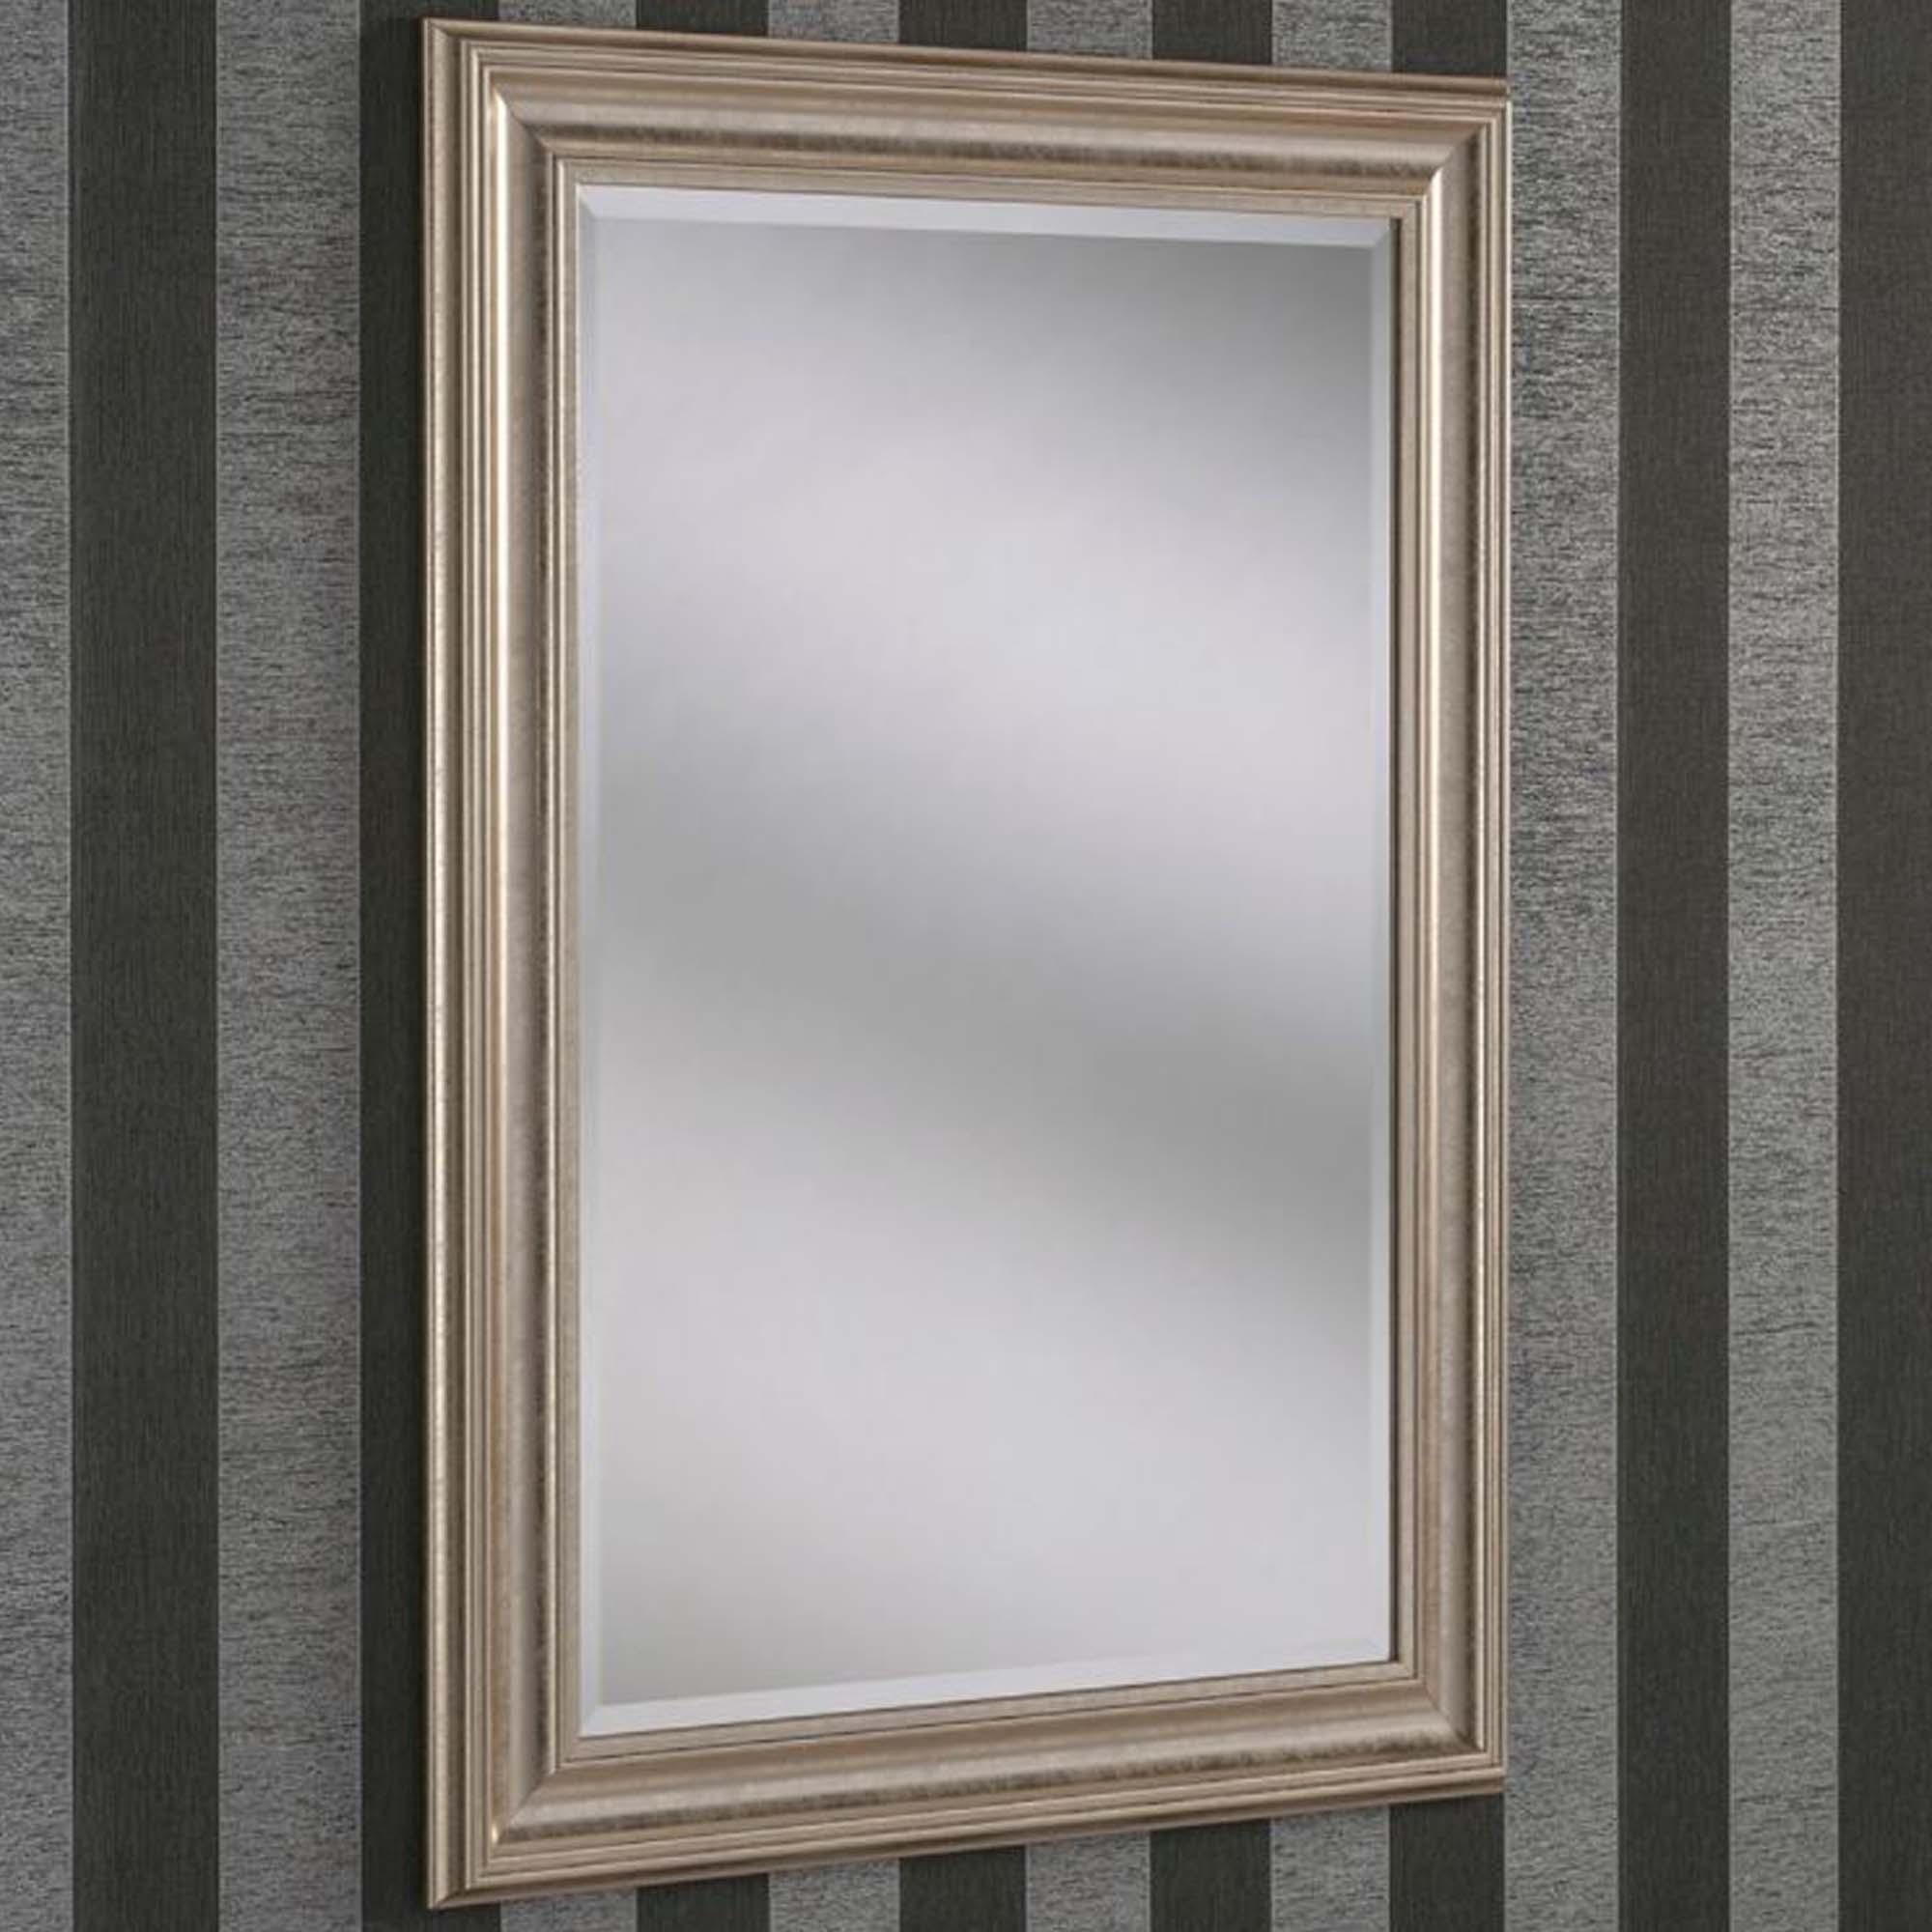 Decorative champagne rectangular wall mirror